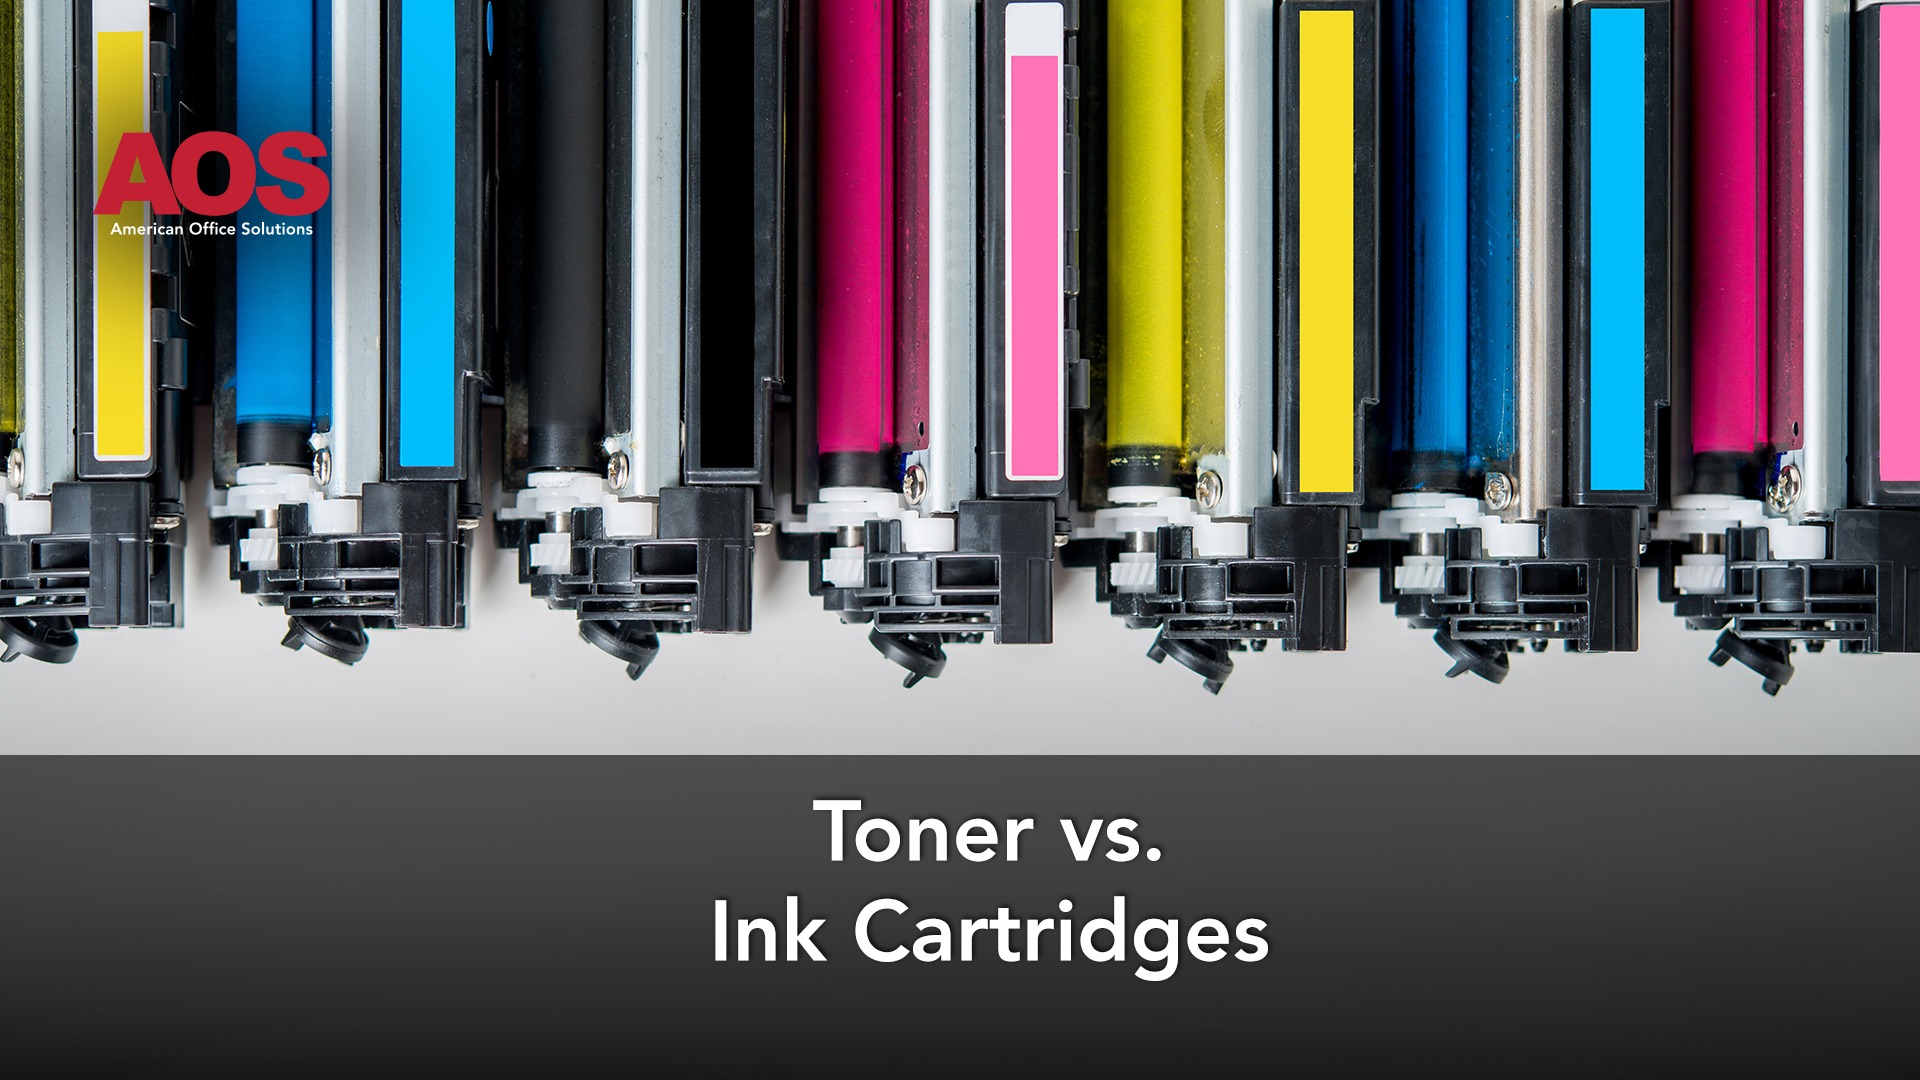 Toner vs Ink Cartridges